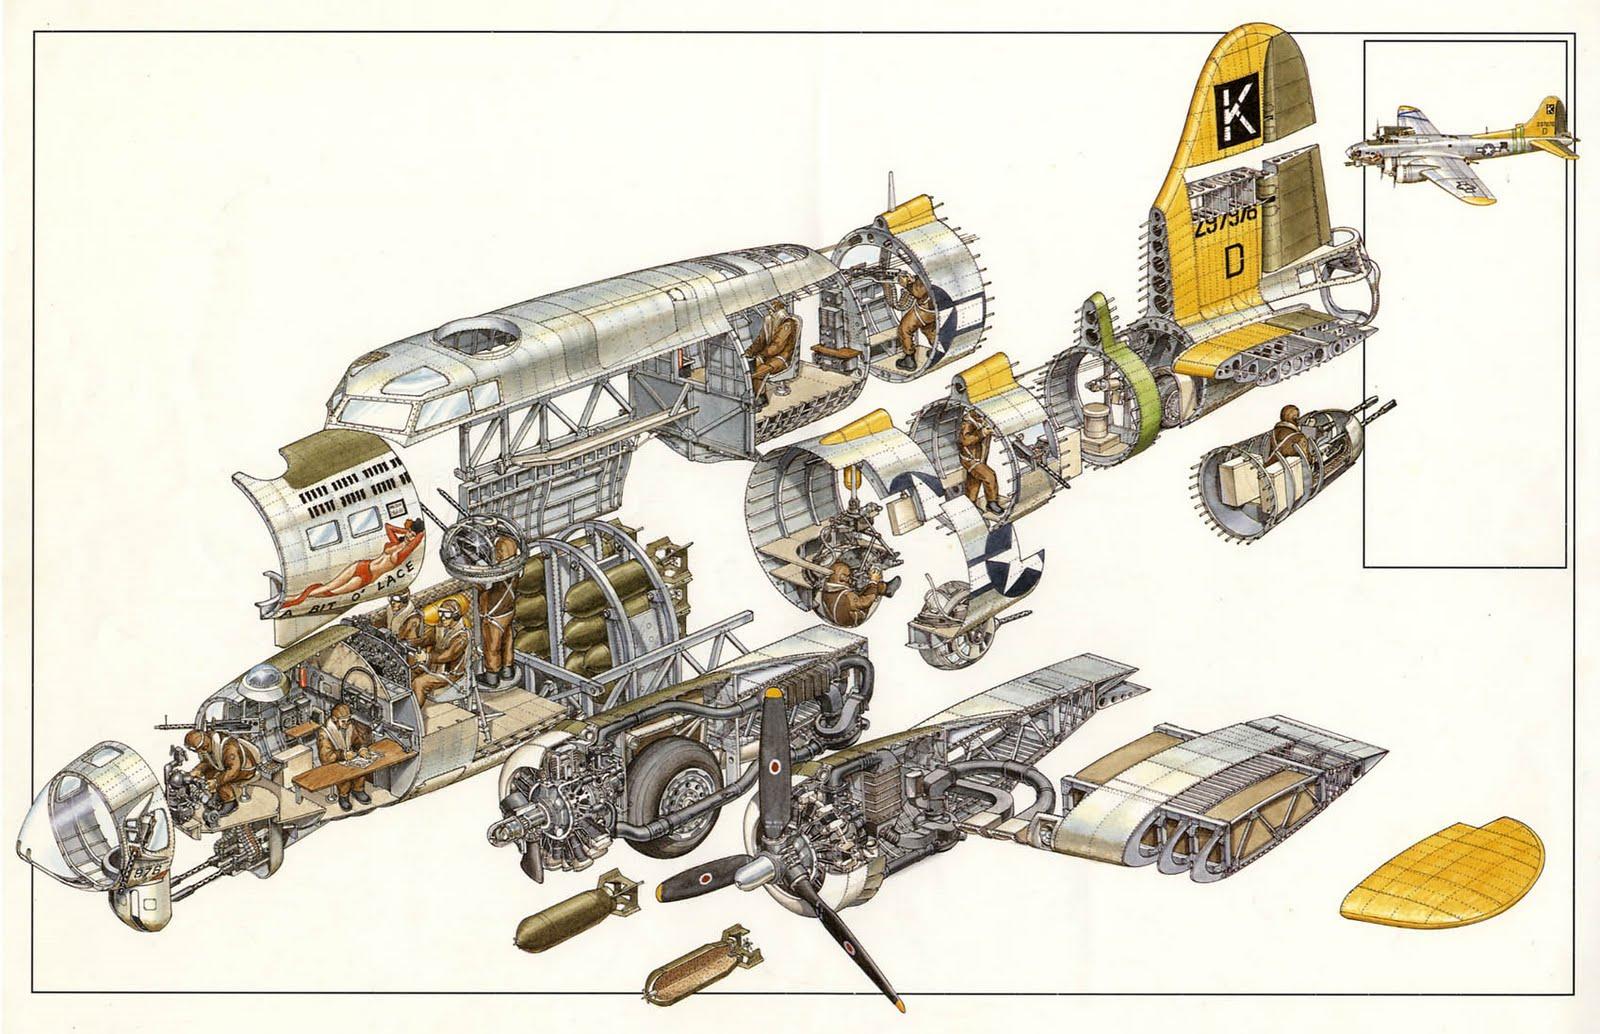 1945 liberator aircraft cutaway and planes rh pinterest com B -29 Bomber Engines B-17 Engine Detail